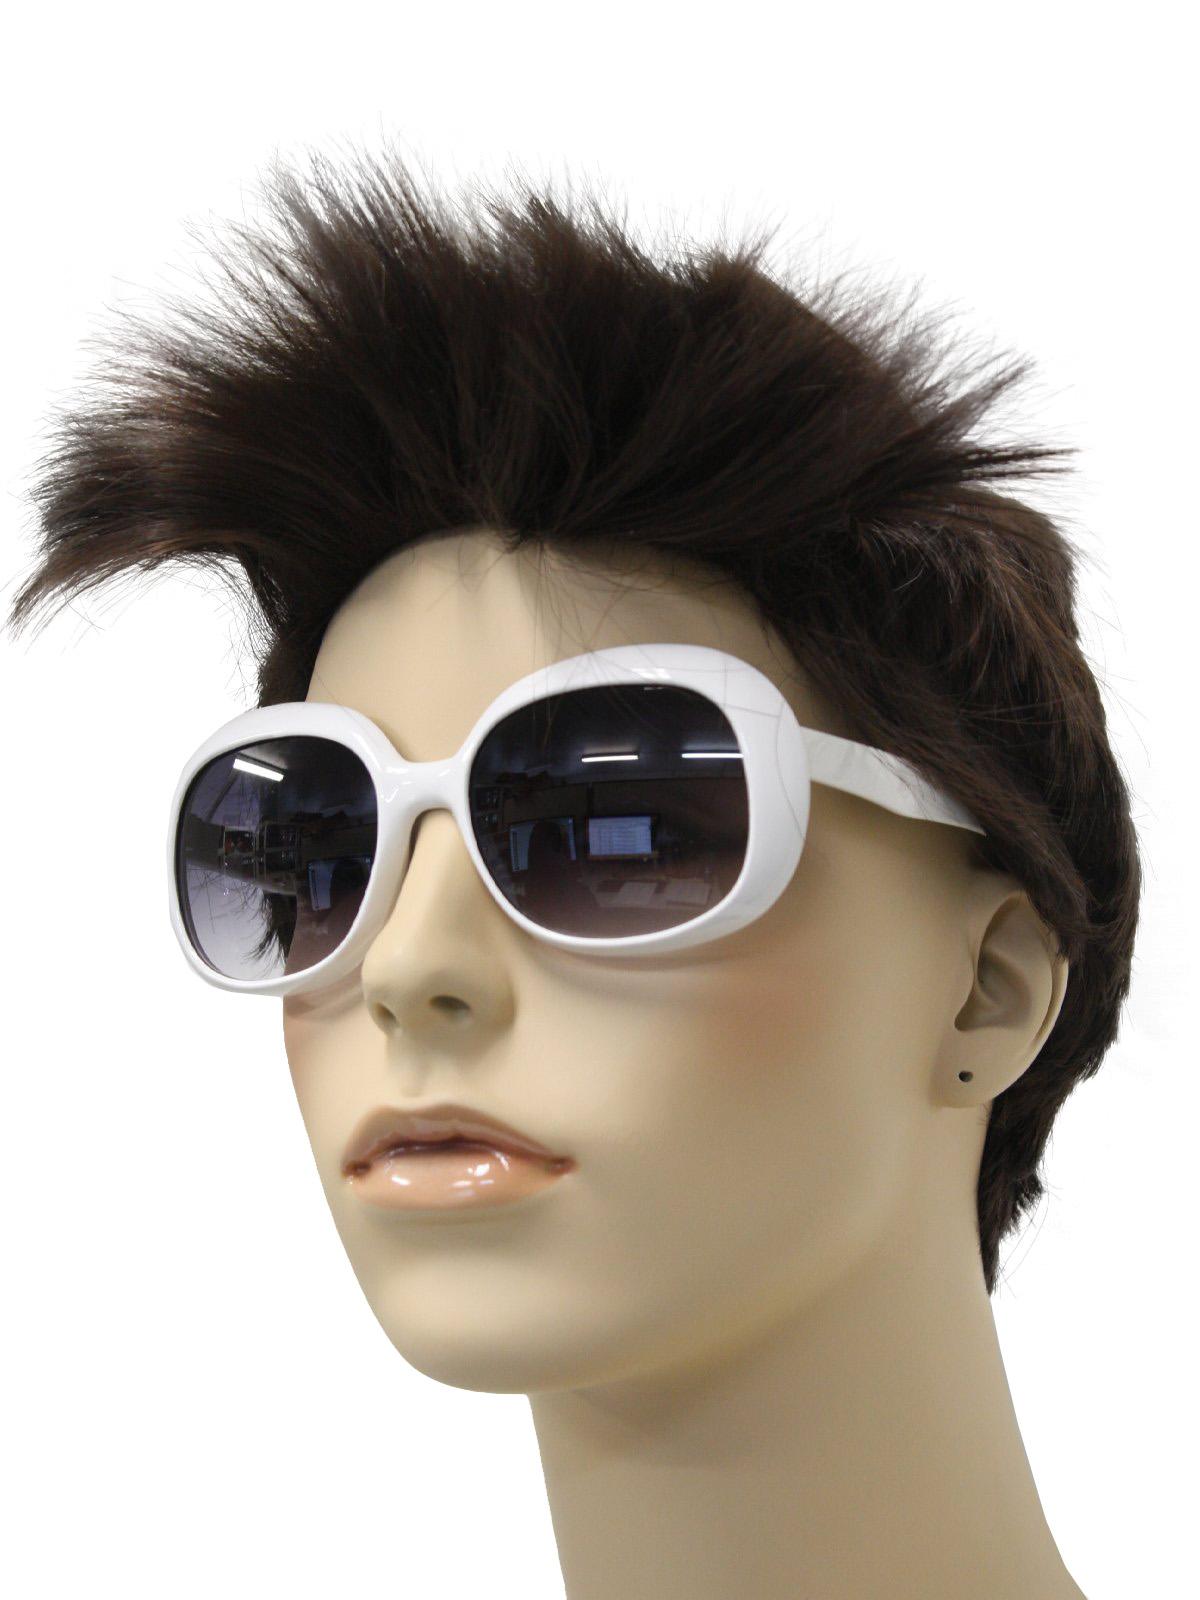 Vintage 60s Glasses 60s Style Mod White Sunglasses